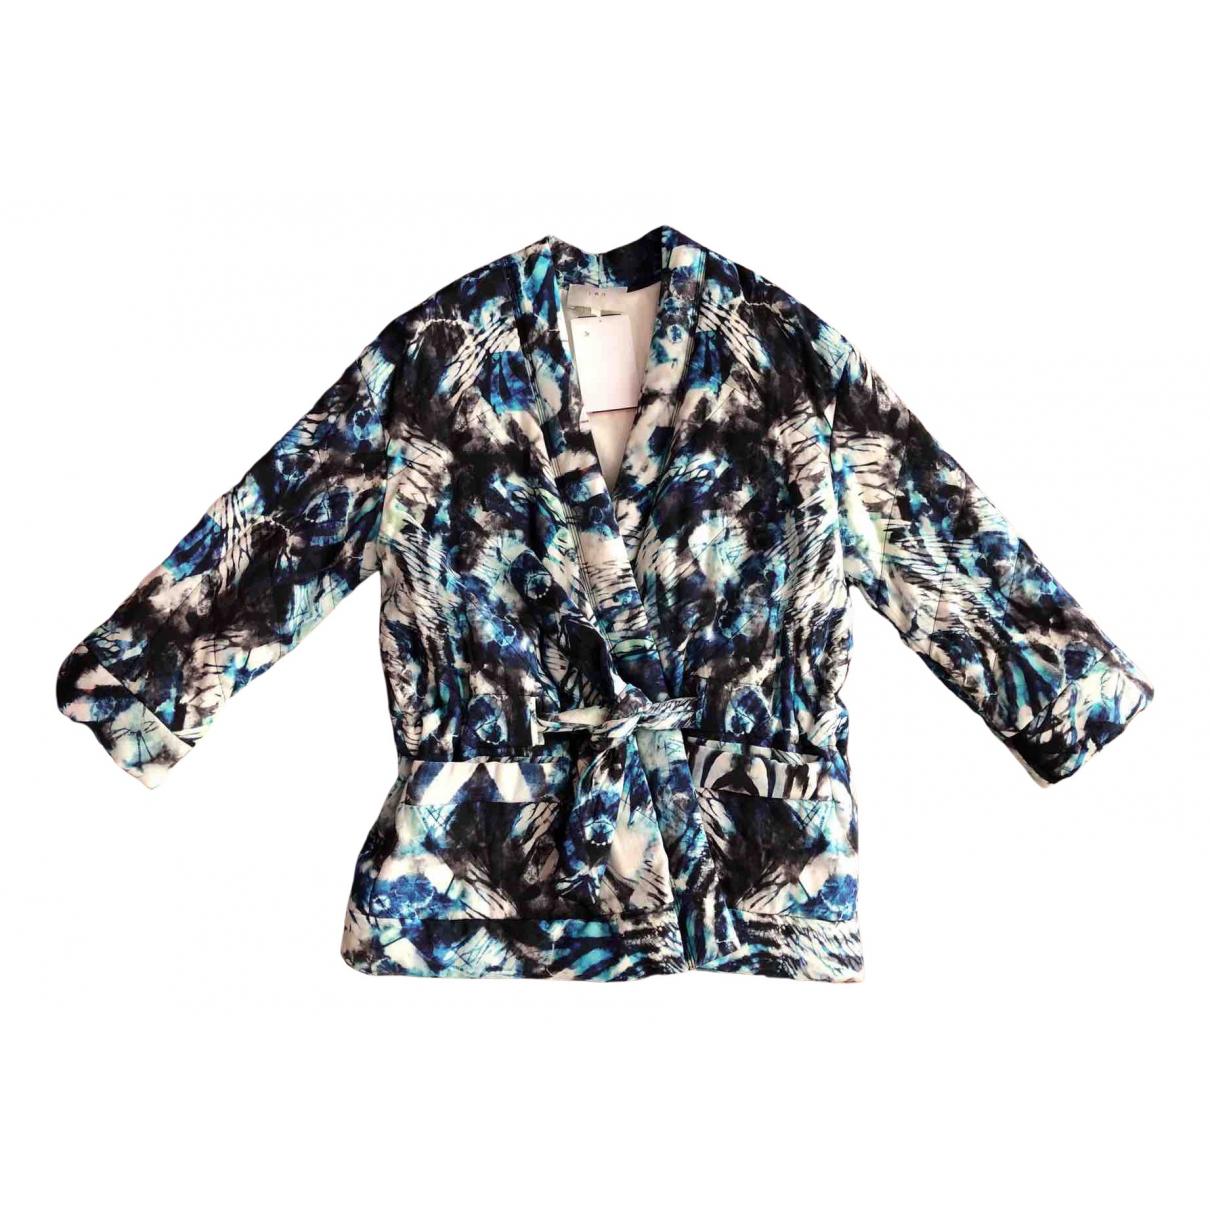 Iro - Veste   pour femme - multicolore